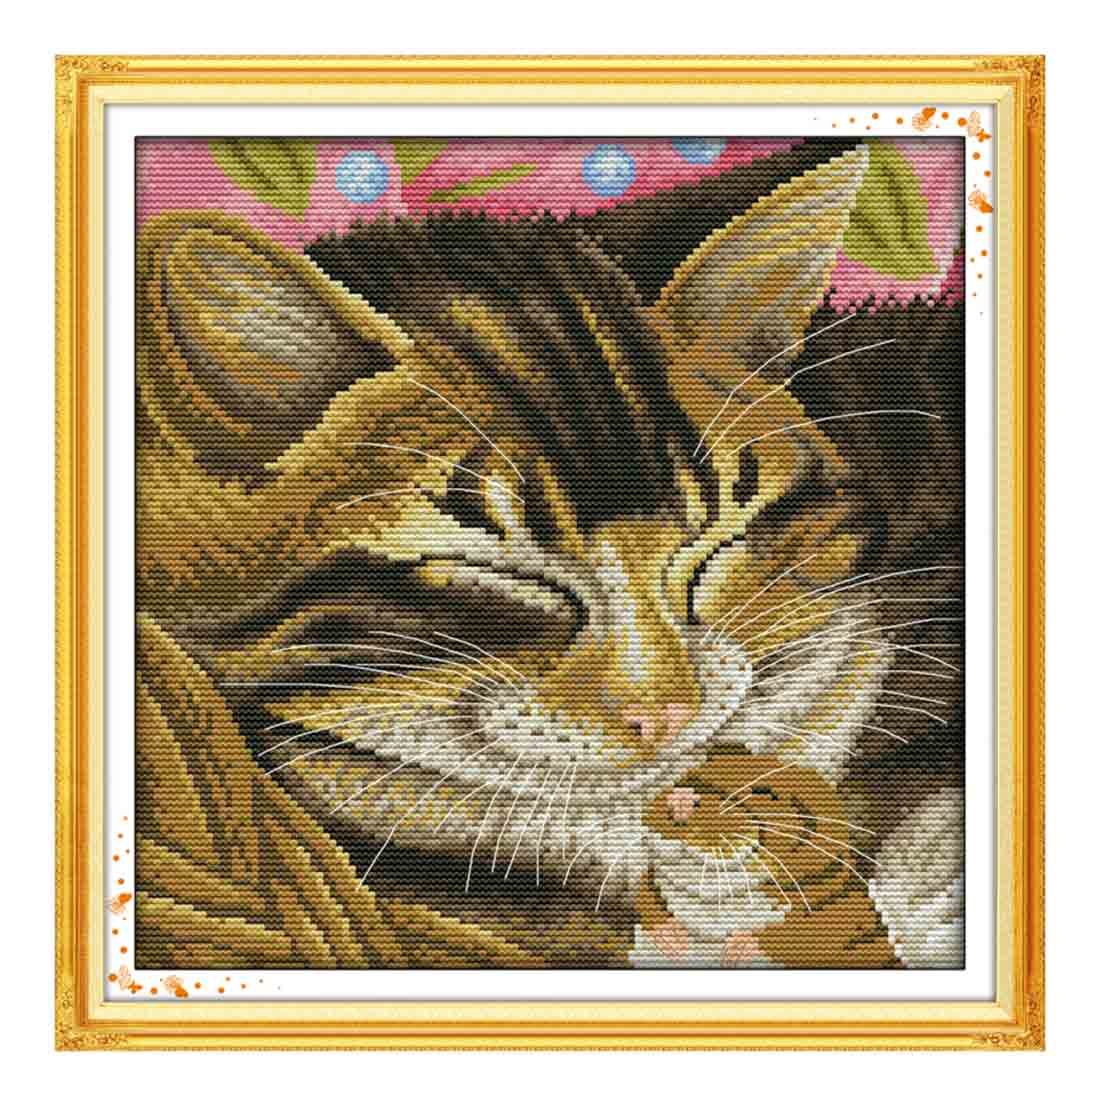 31 X 31cm 14CT 2 Strands Printing Cross Stitch Kits DIY Decorative Cross-stitch Craft Toys Kit (Without Frame) - Snicker Cat